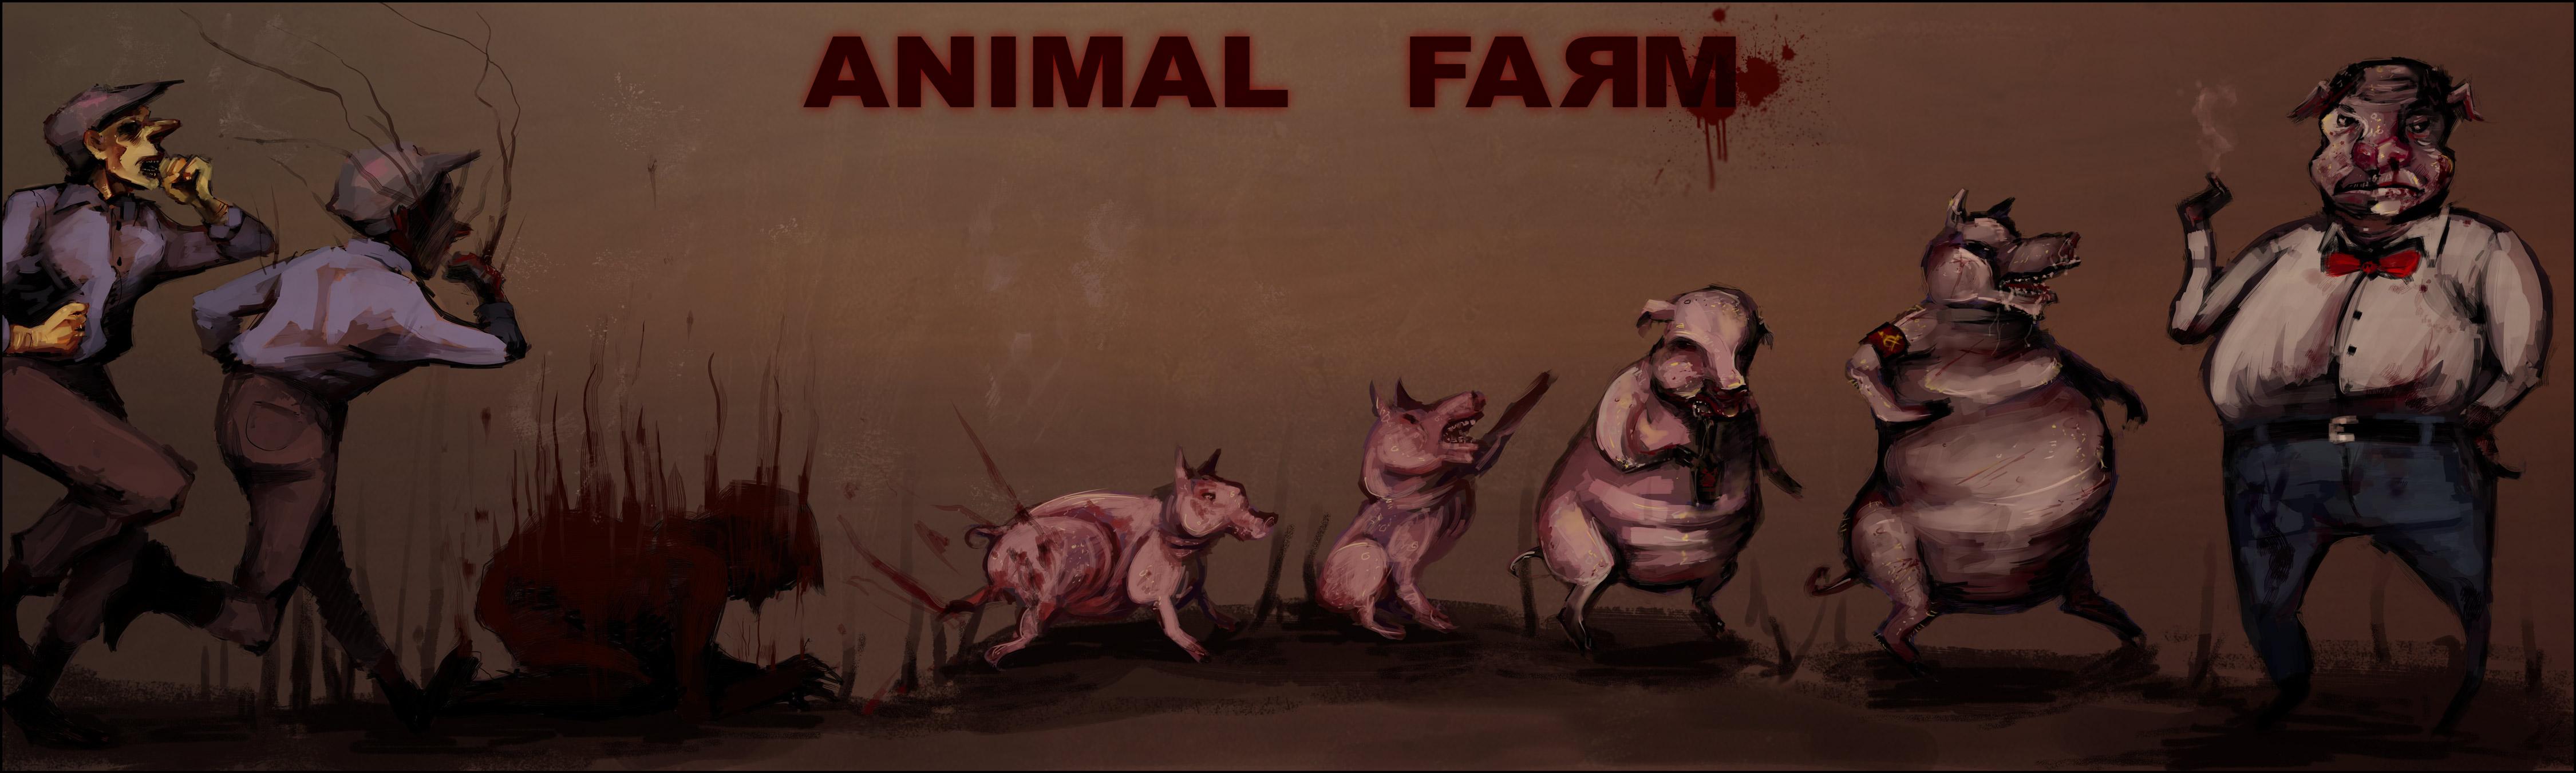 animal farm george orwell essay enotescom sparknotes animal farm study questions essay topics